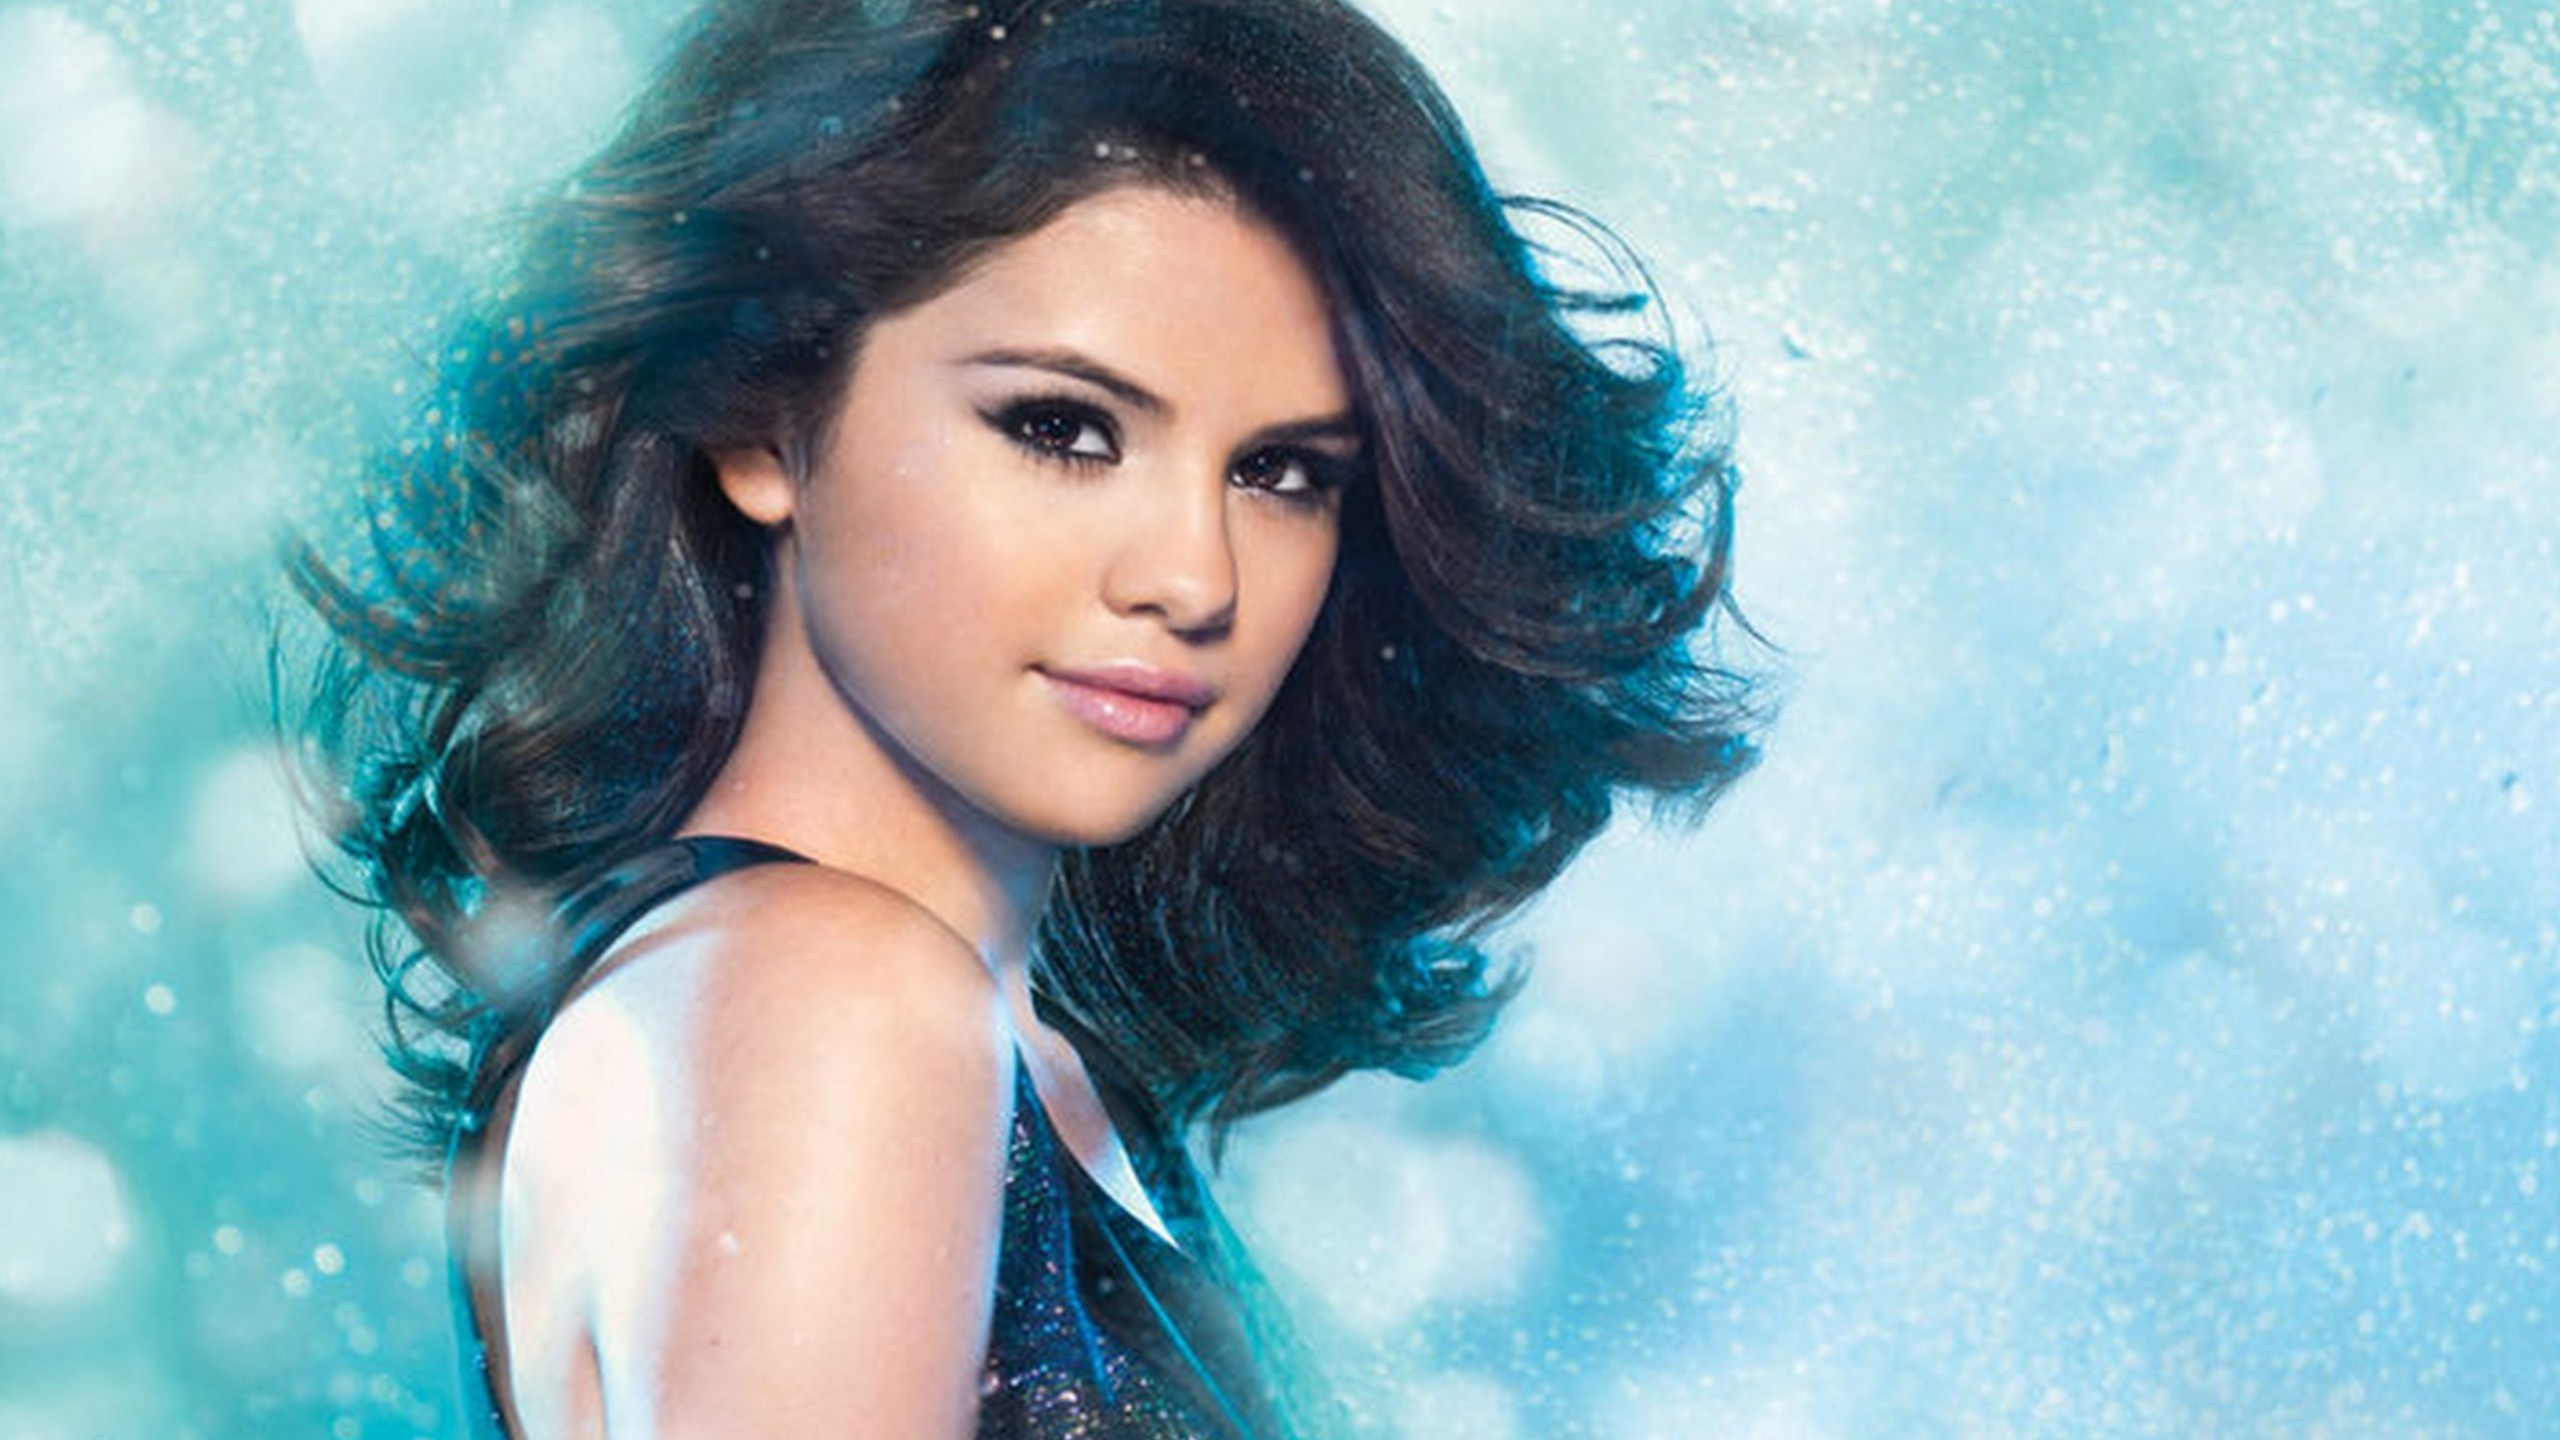 Selena Gomez Background Wallpaper